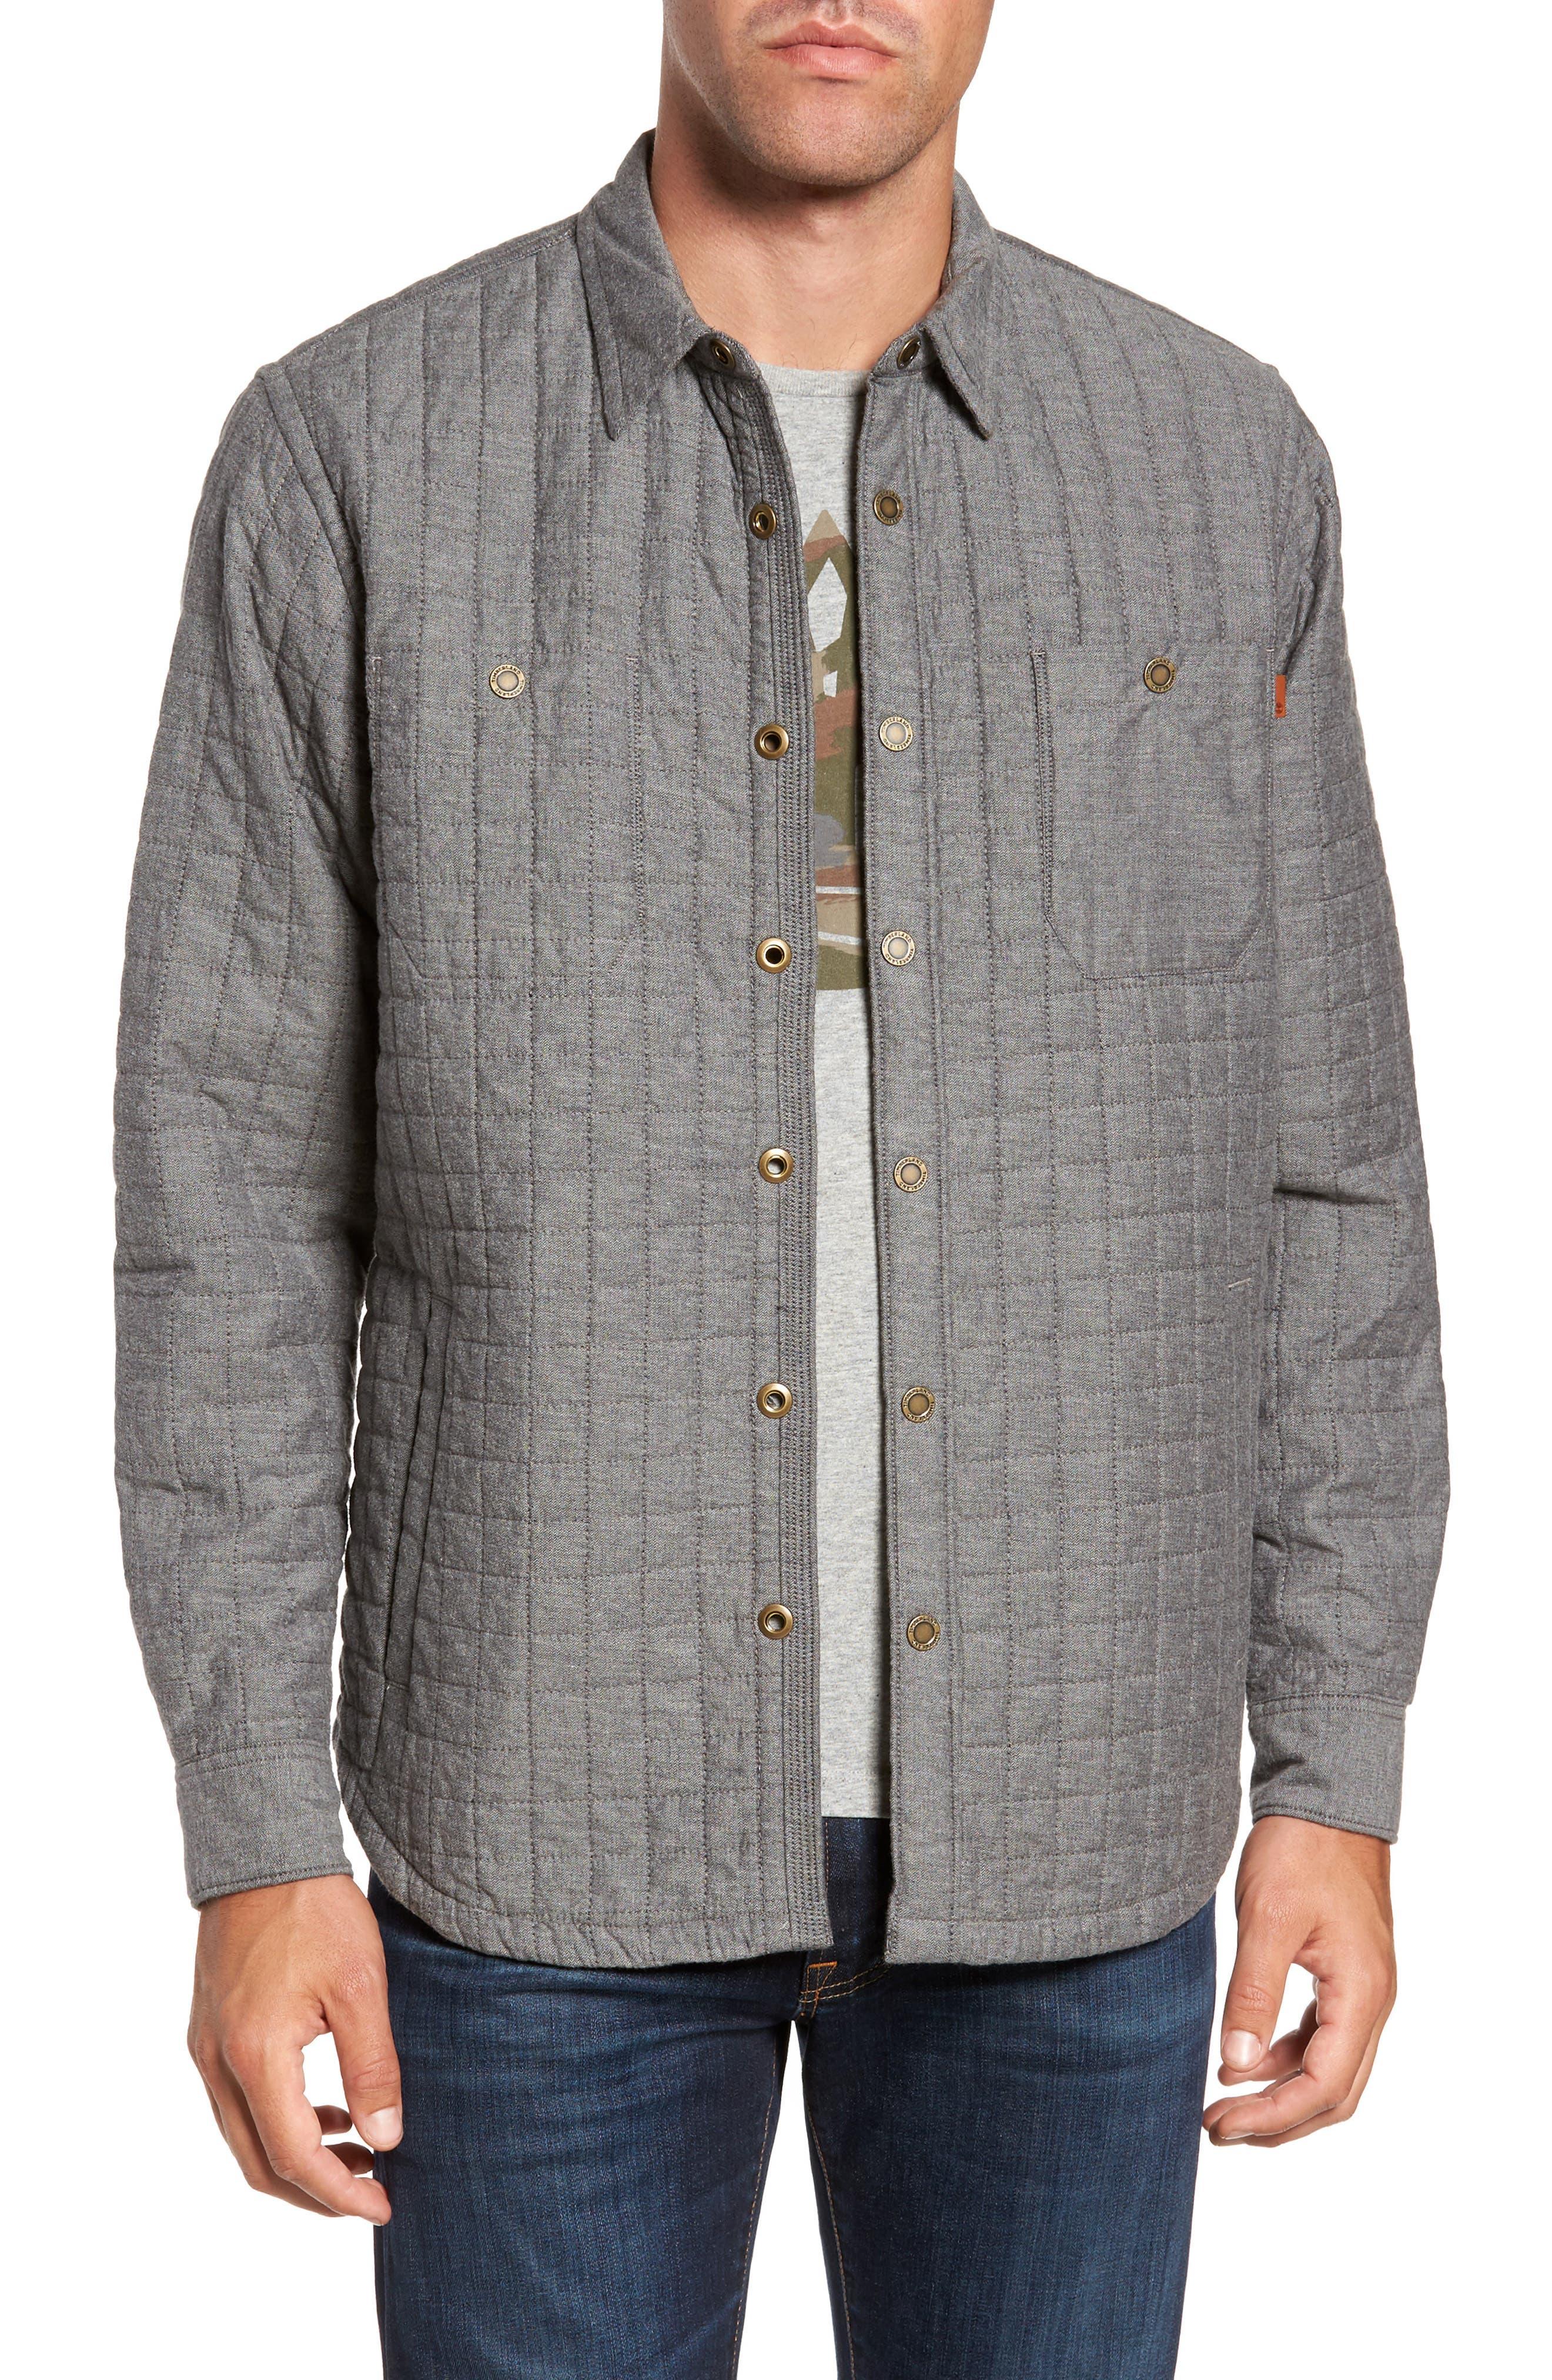 Gunstock River Lightweight Quilted Shirt Jacket,                         Main,                         color, 001